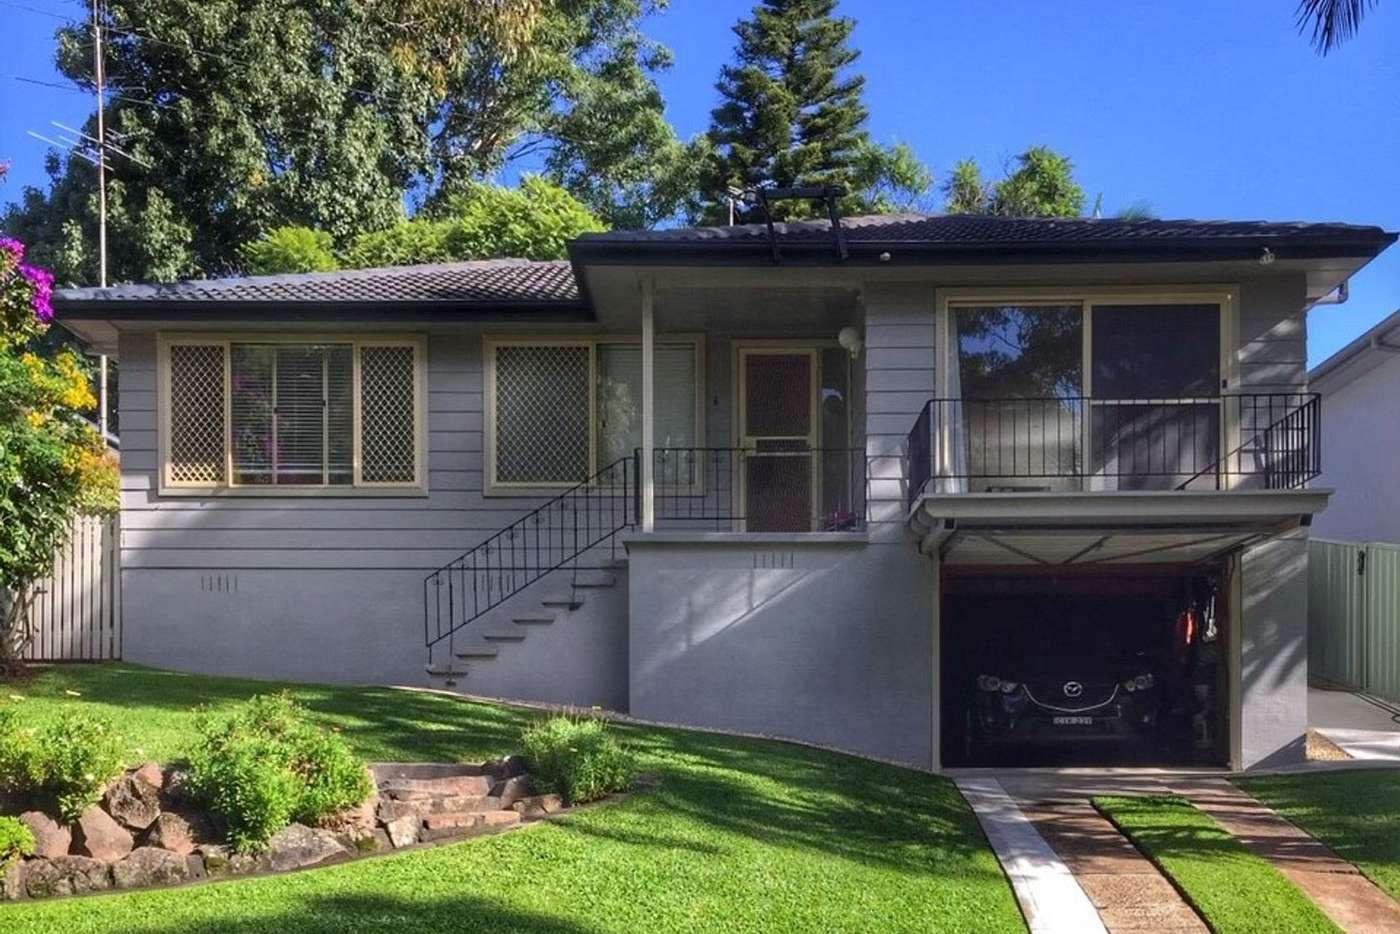 Main view of Homely house listing, 6 Kirika Street, Charlestown NSW 2290